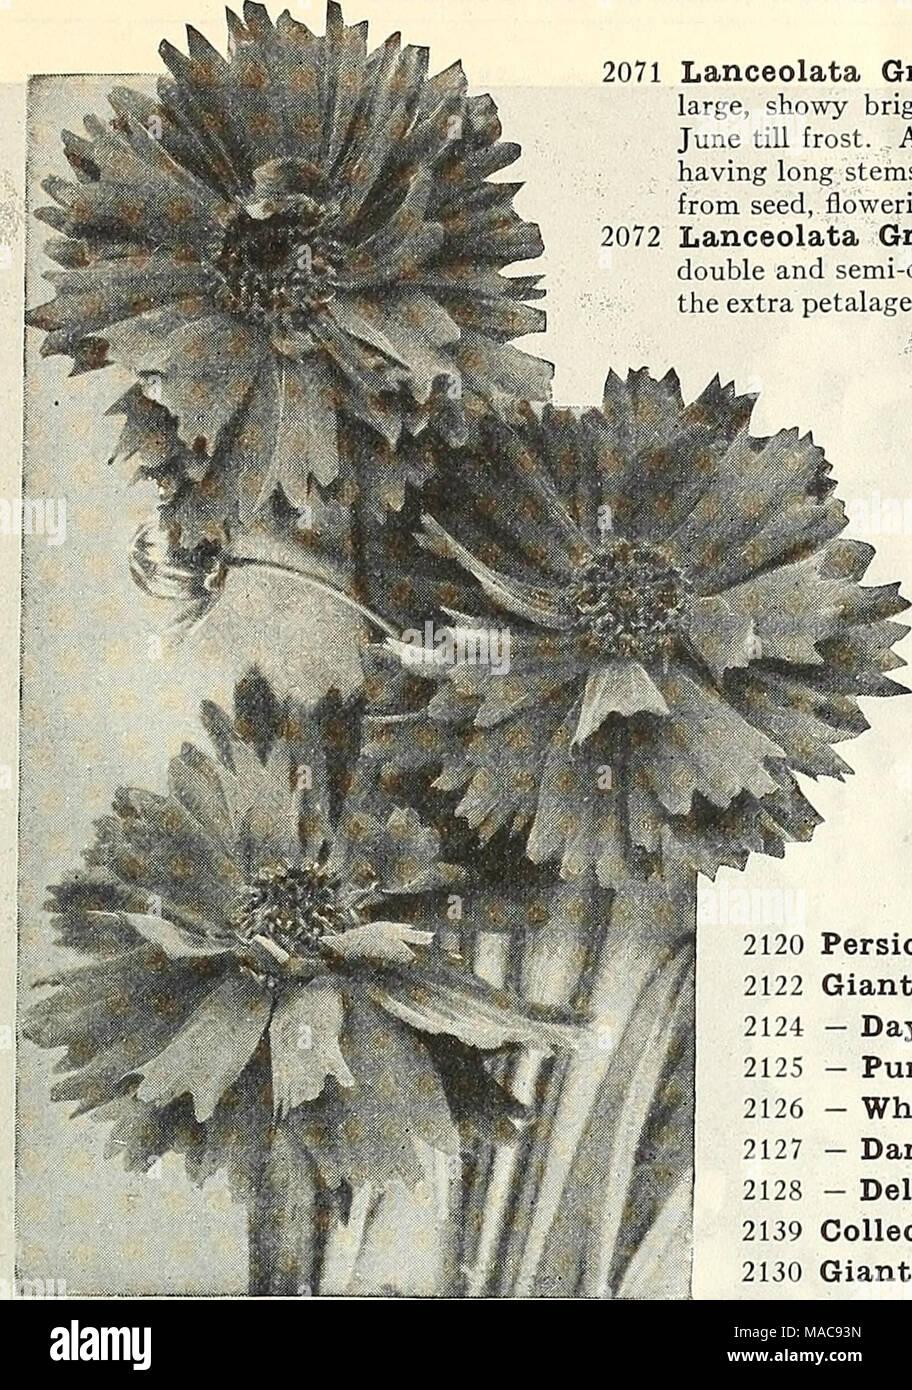 Dreers Midsummer List 1927 New Double Flowering Coreopsis